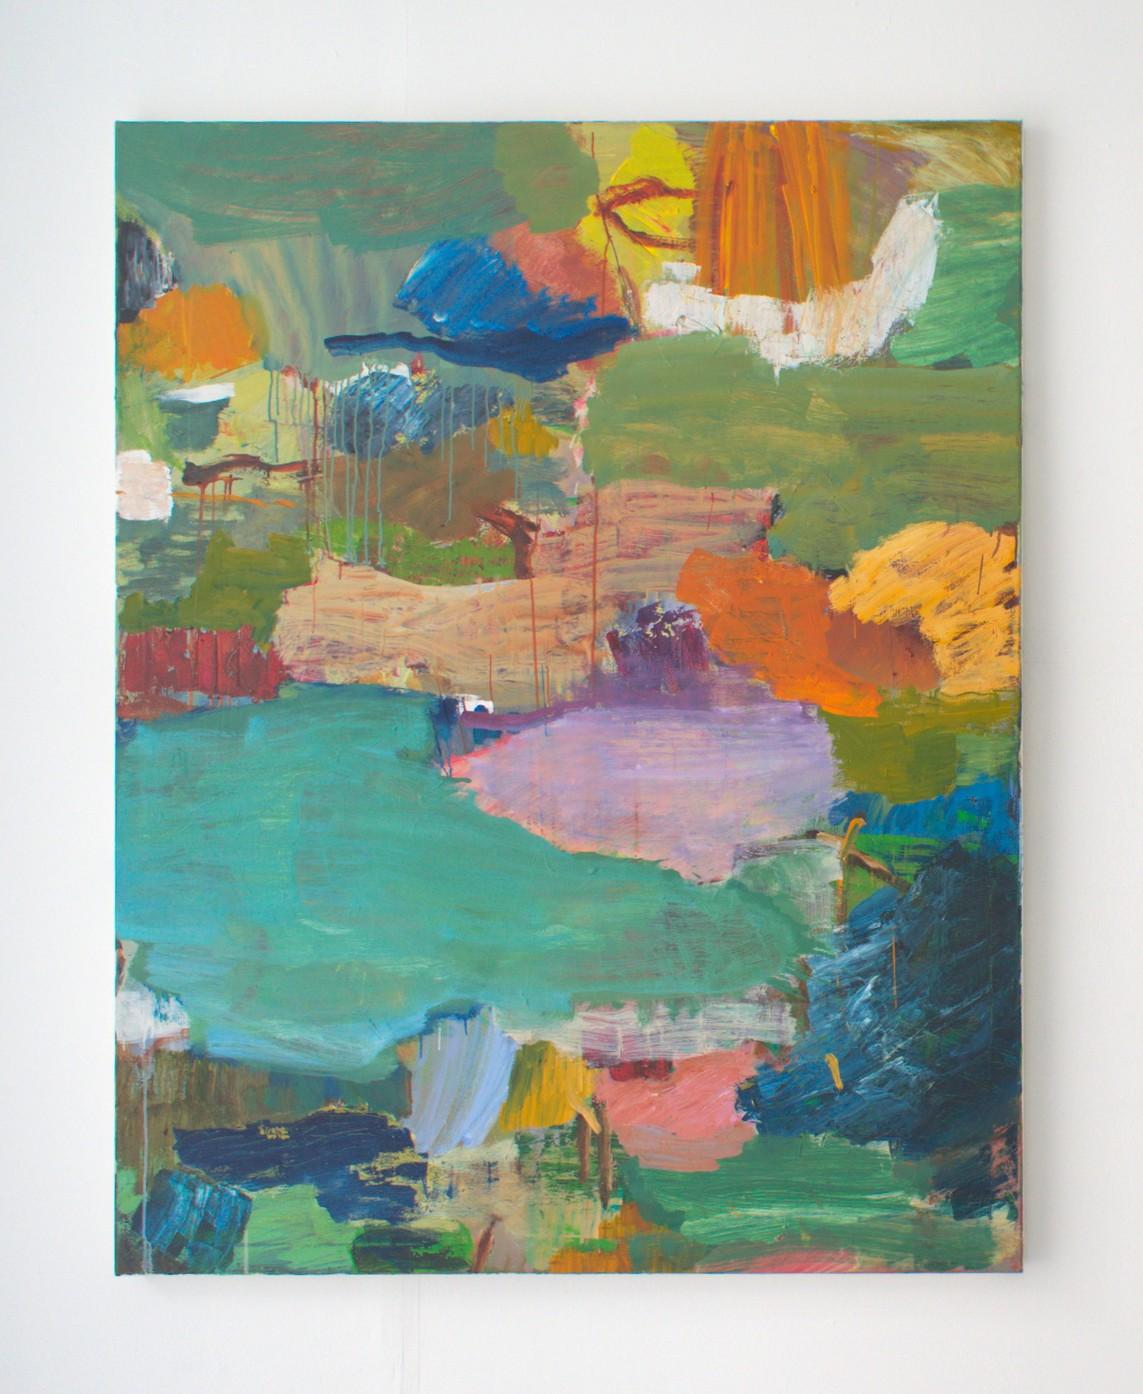 OT Nr. 03, 2018, Öl auf Leinwand, 150 x 120 cm